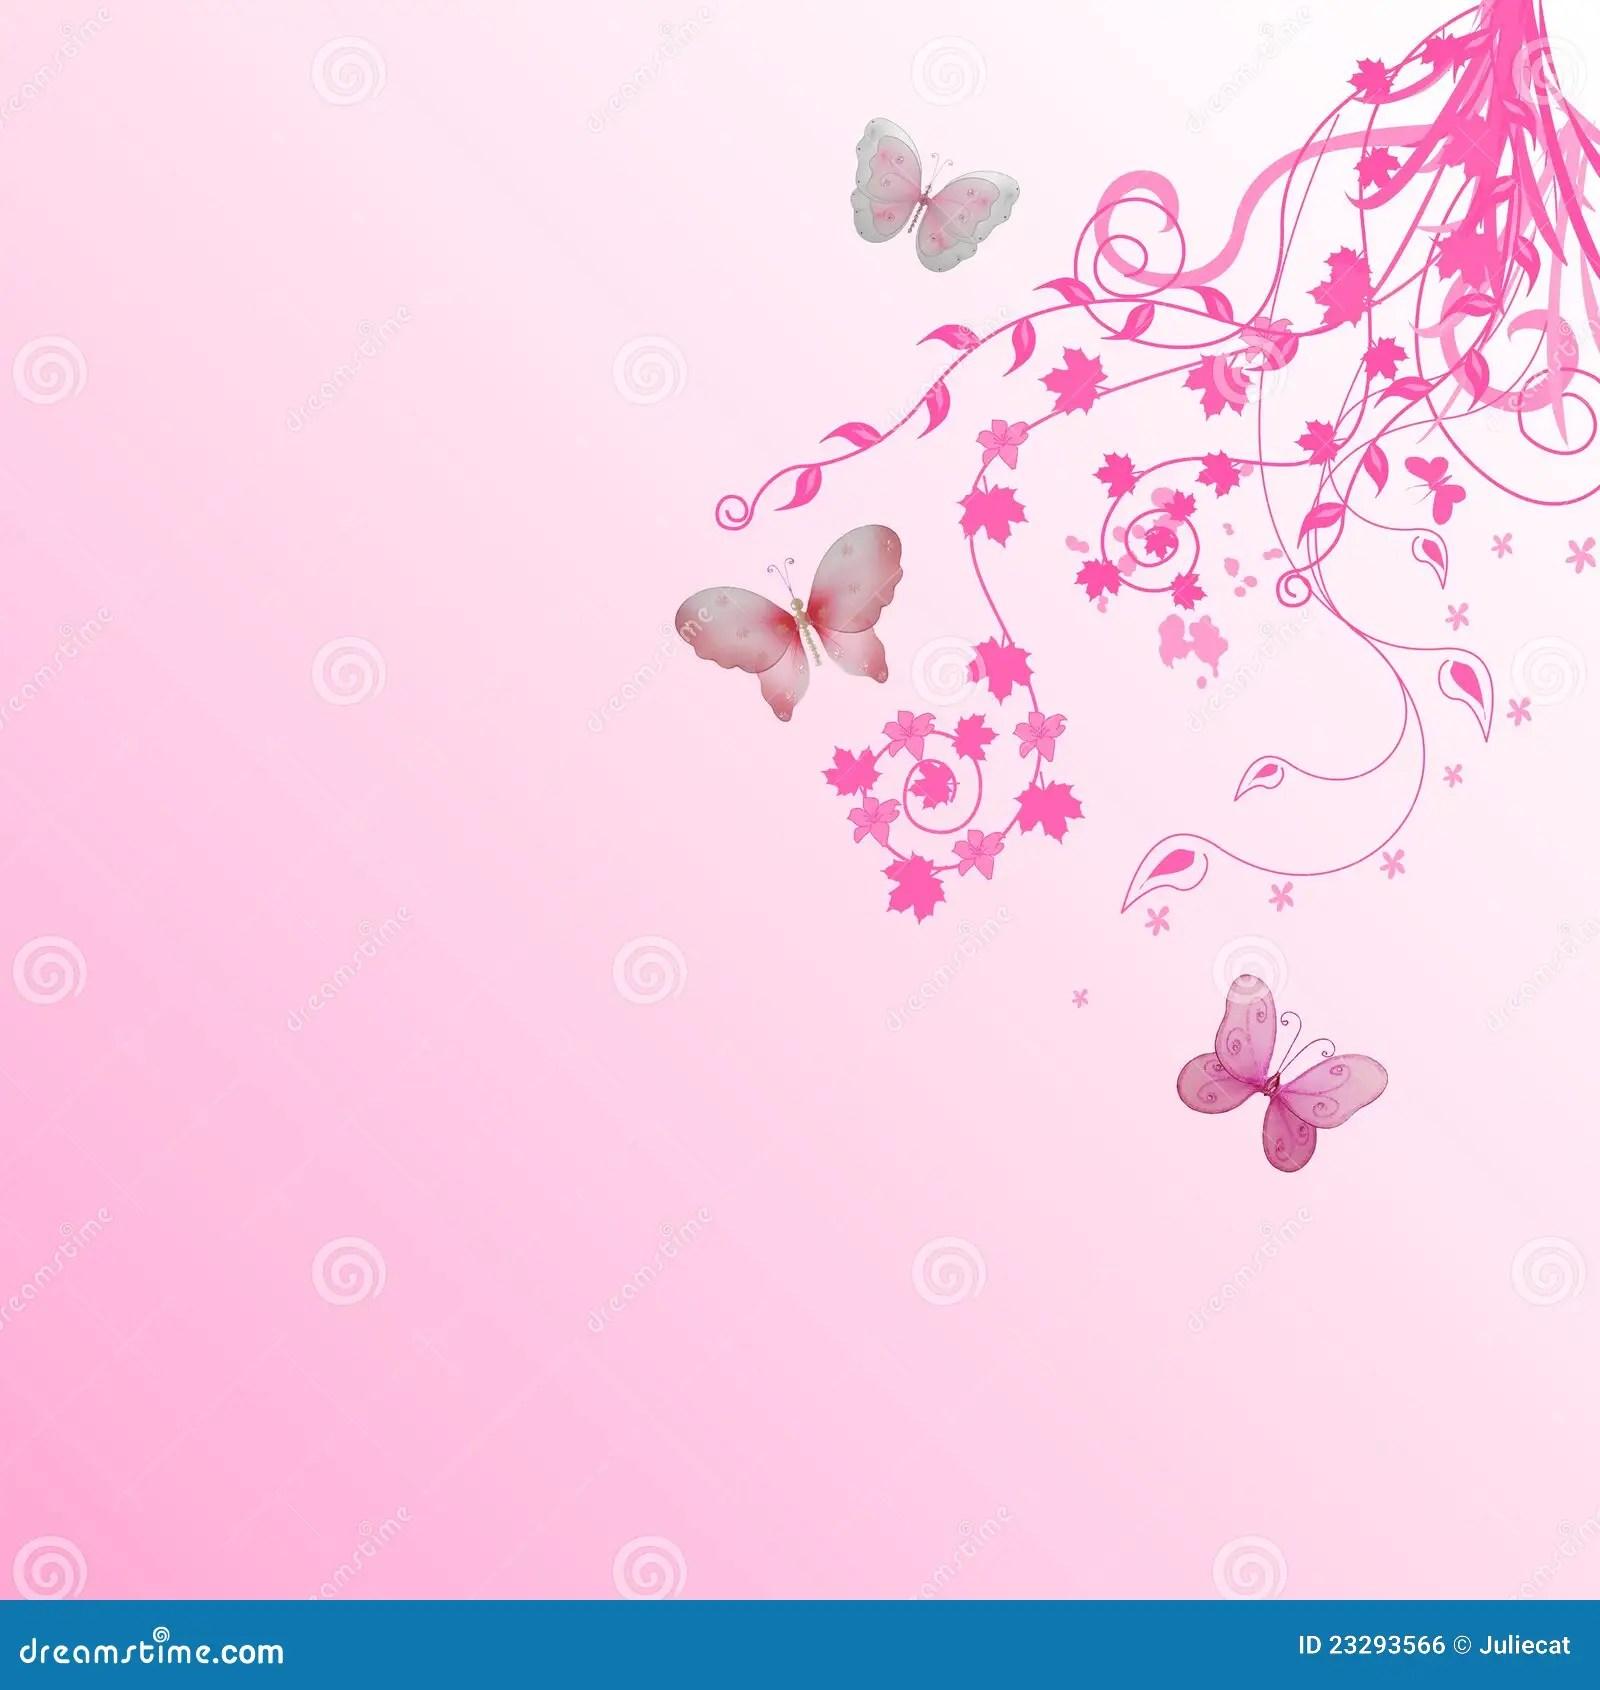 3d Wallpaper For Master Bedroom Pink Floral Butterflies Background Stock Illustration